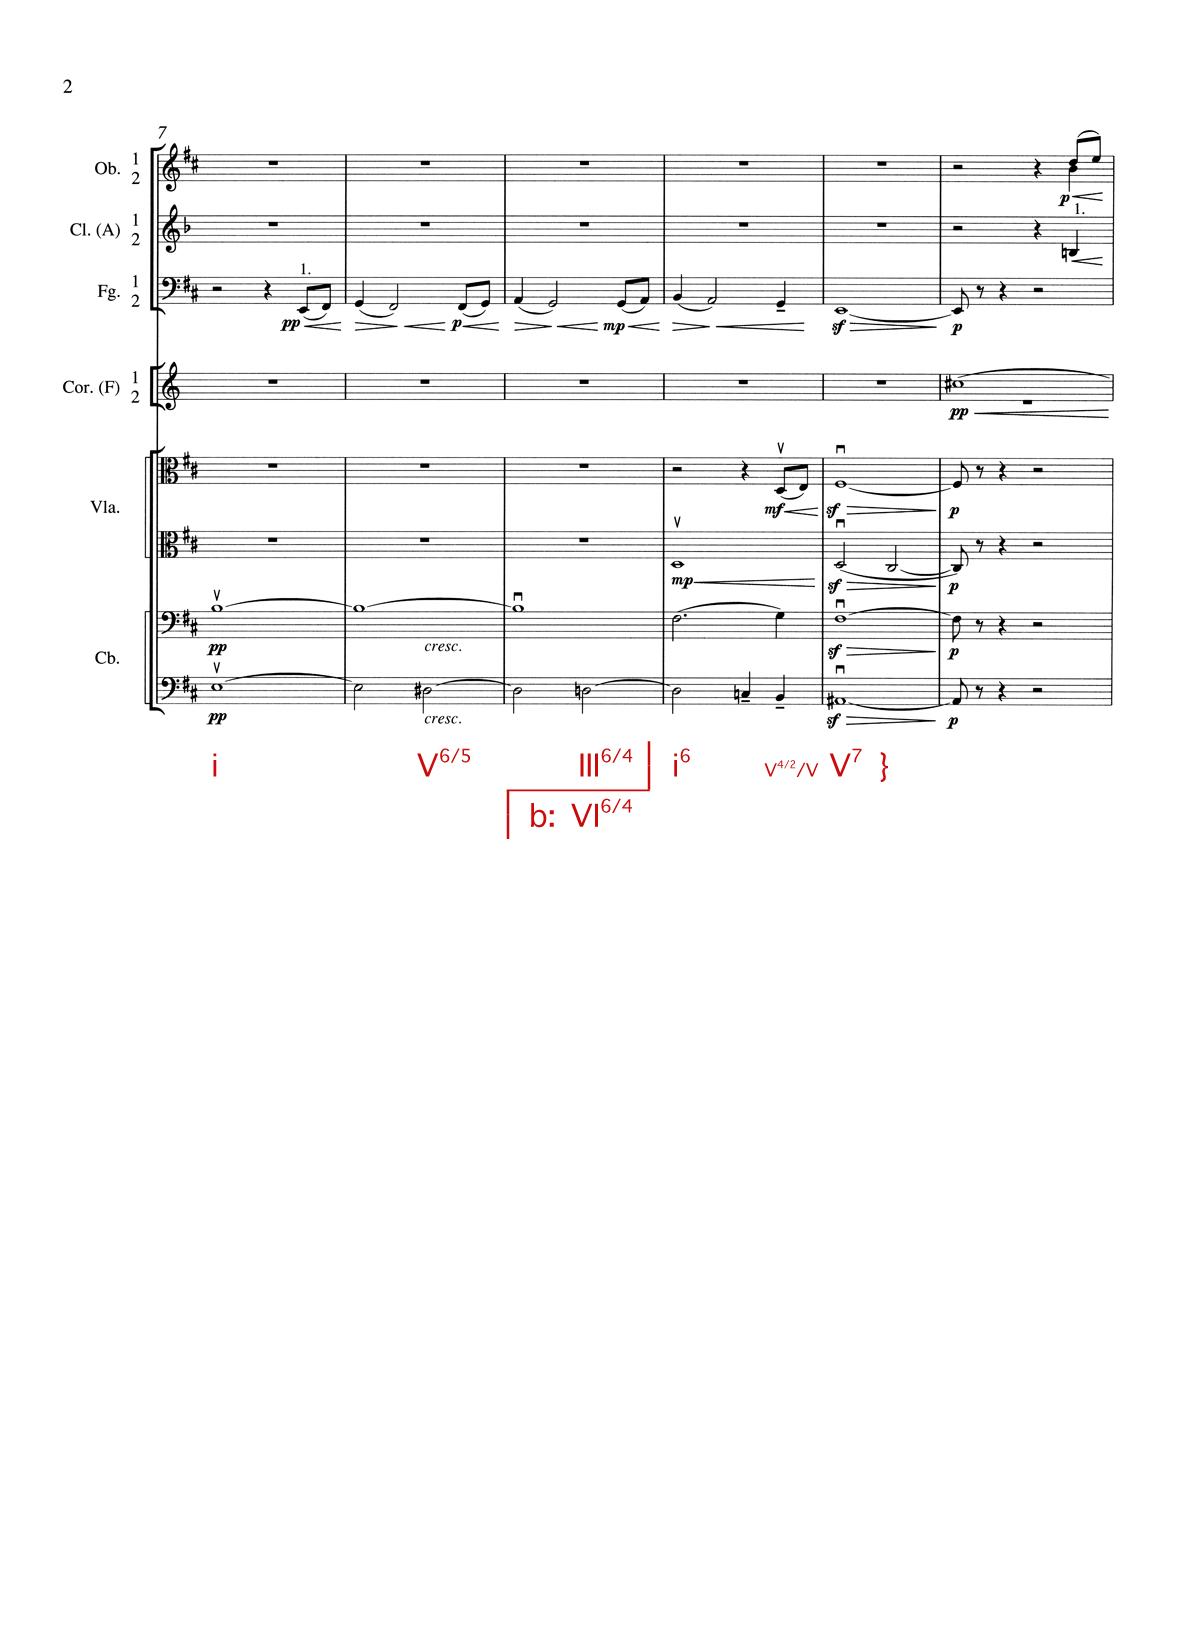 Tchaikovsky 6 theory_2.jpg